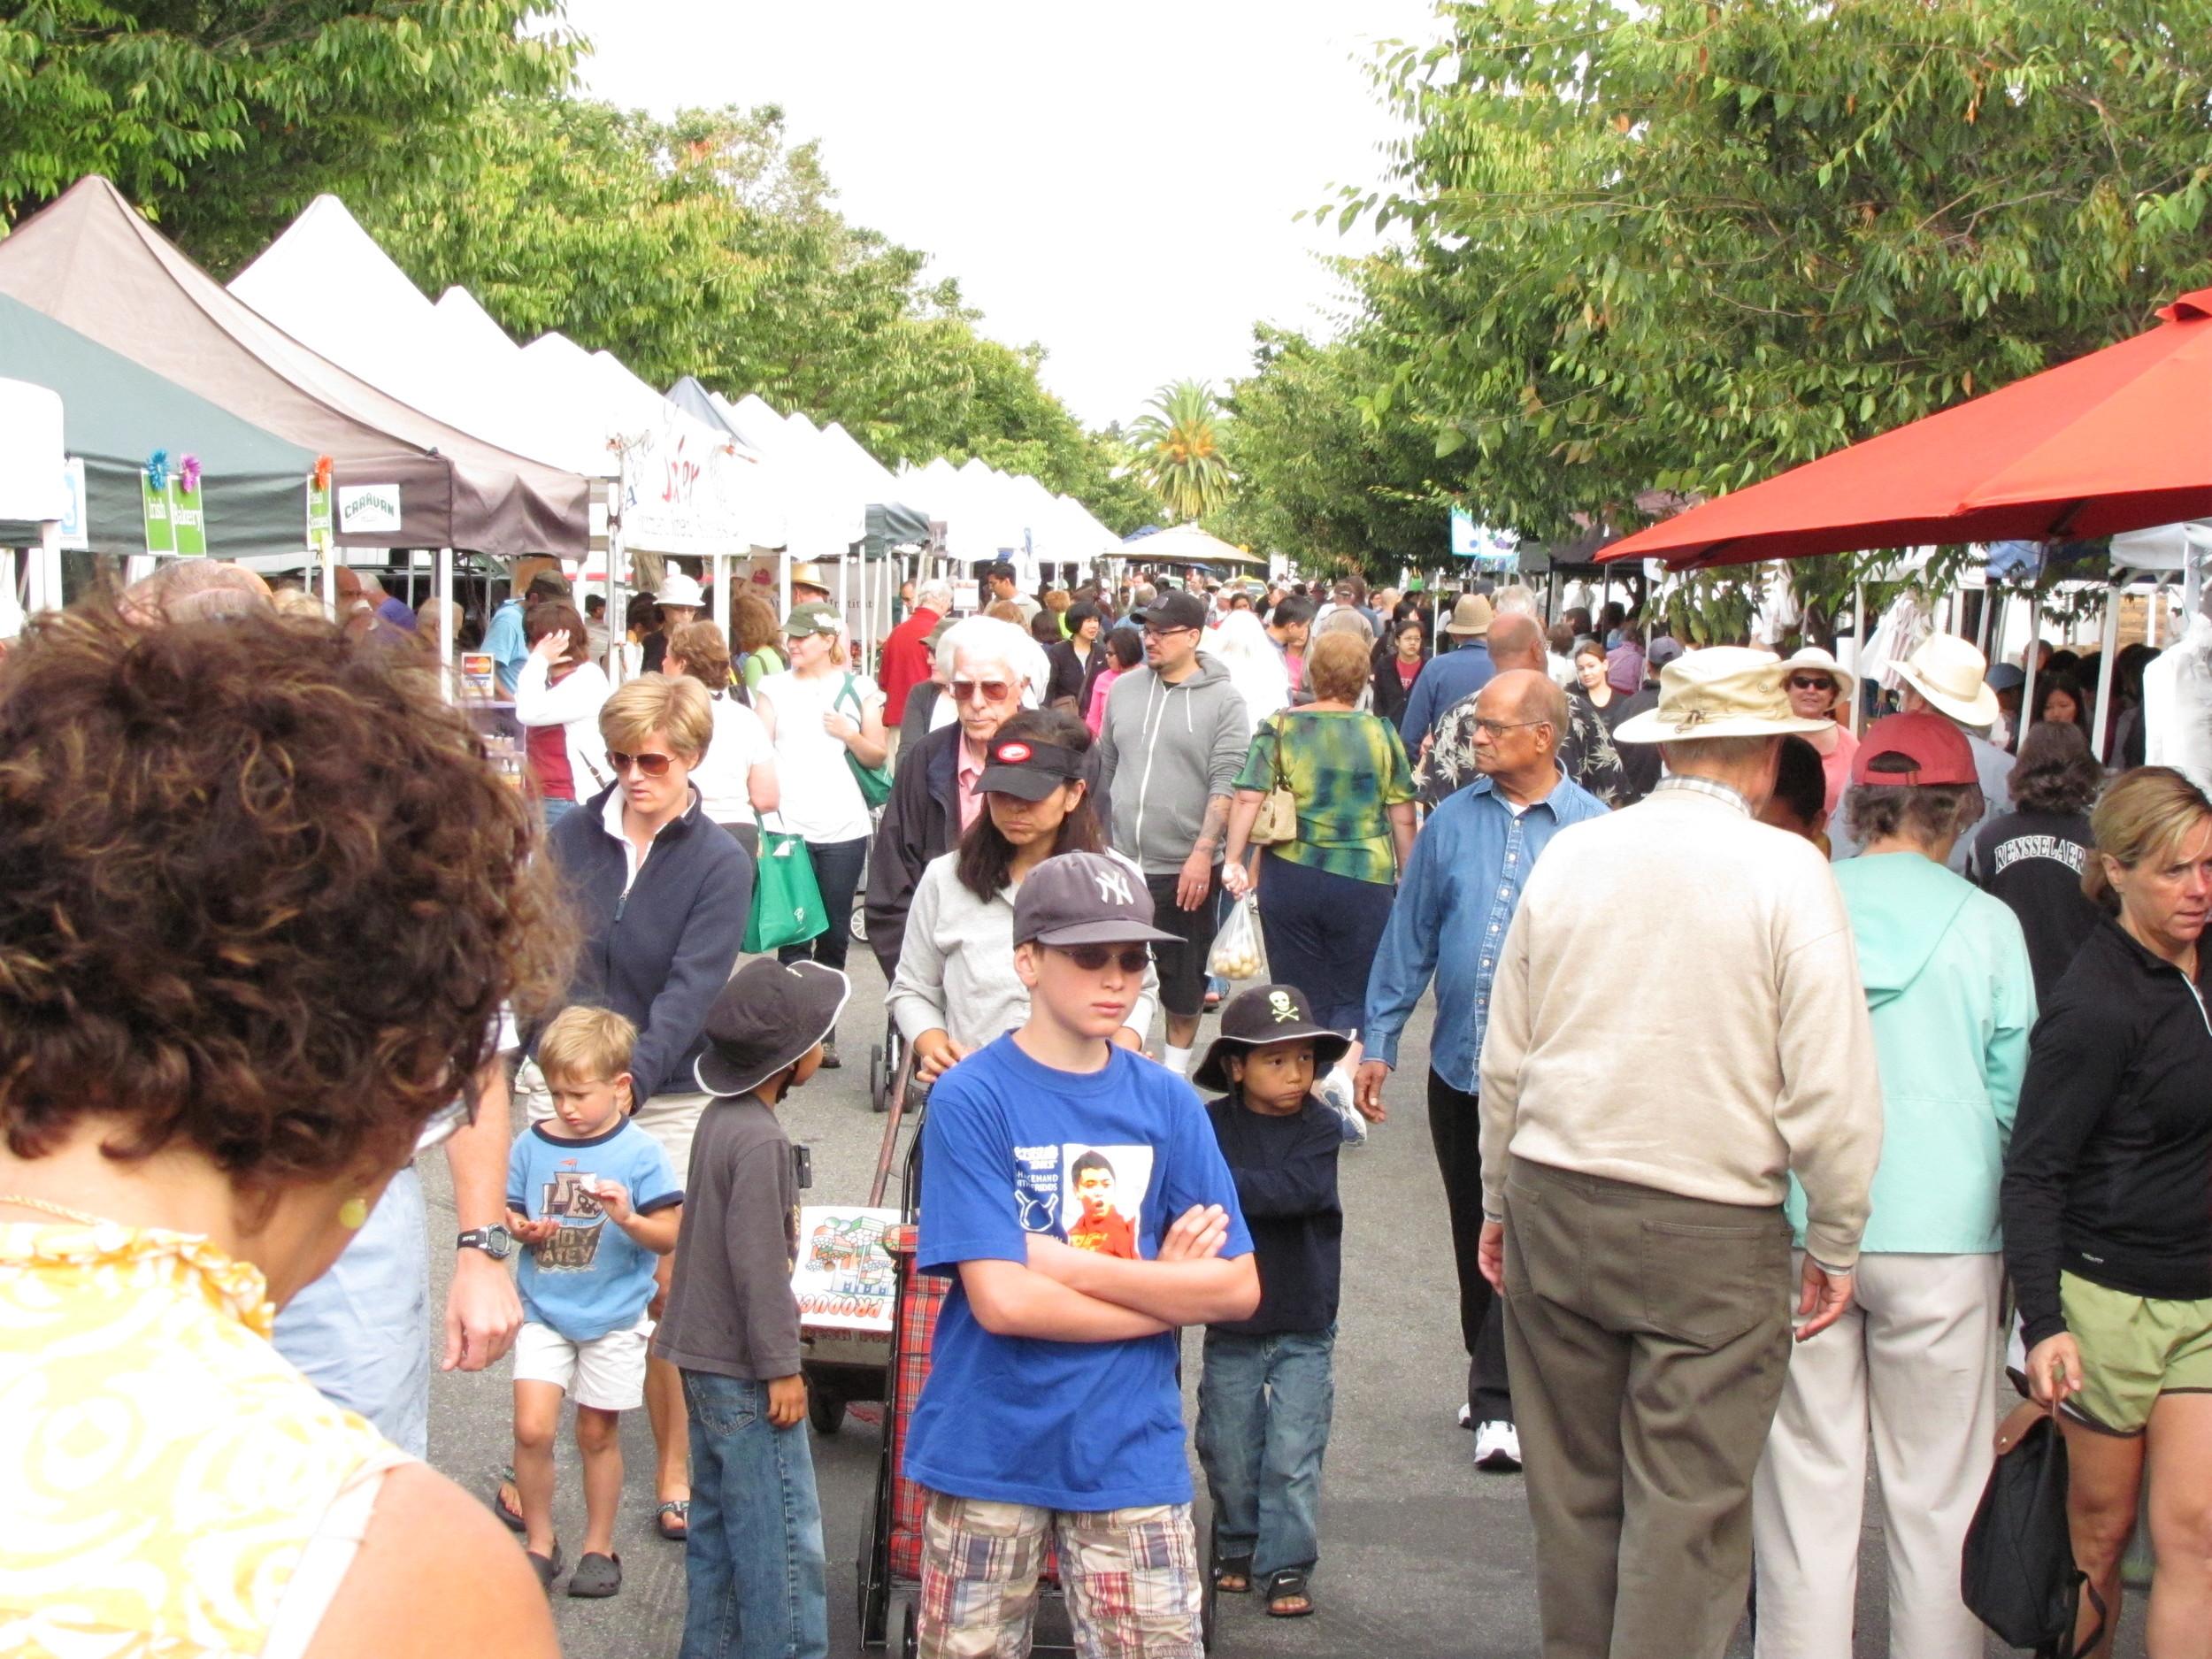 Mountain View Farmers' Market